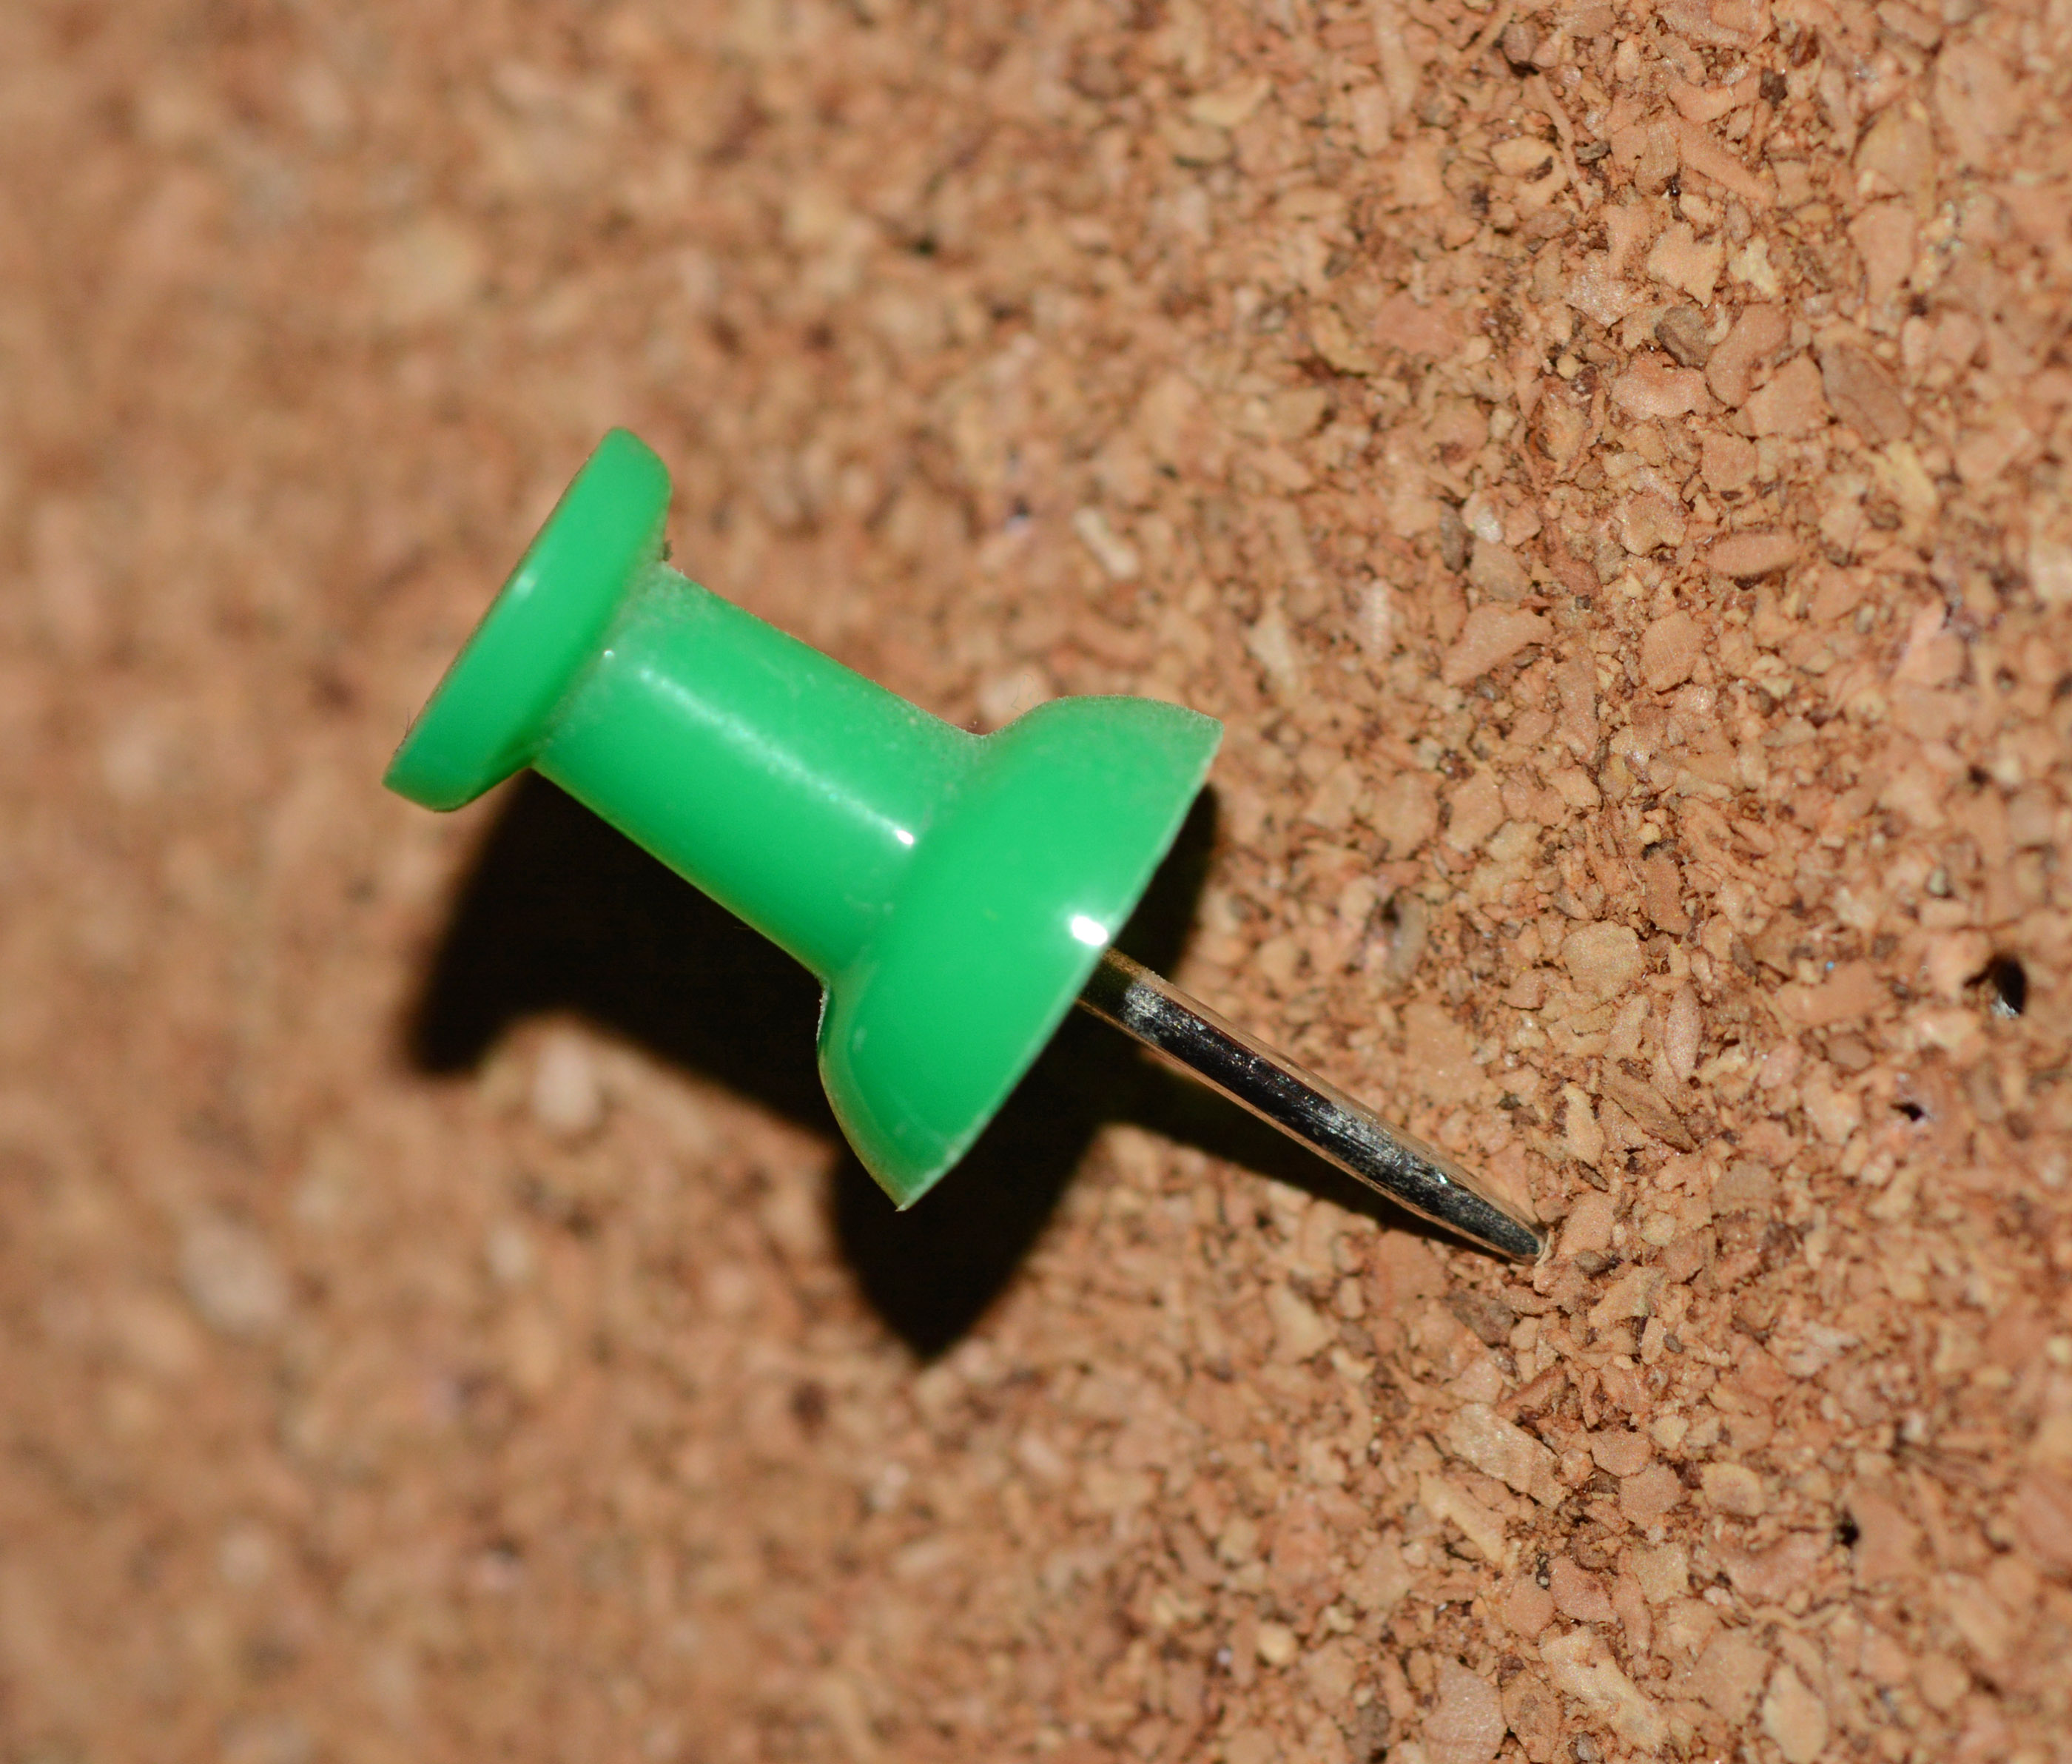 File:A thumb tack AKA push pin on a cork board.JPG - Wikimedia Commons